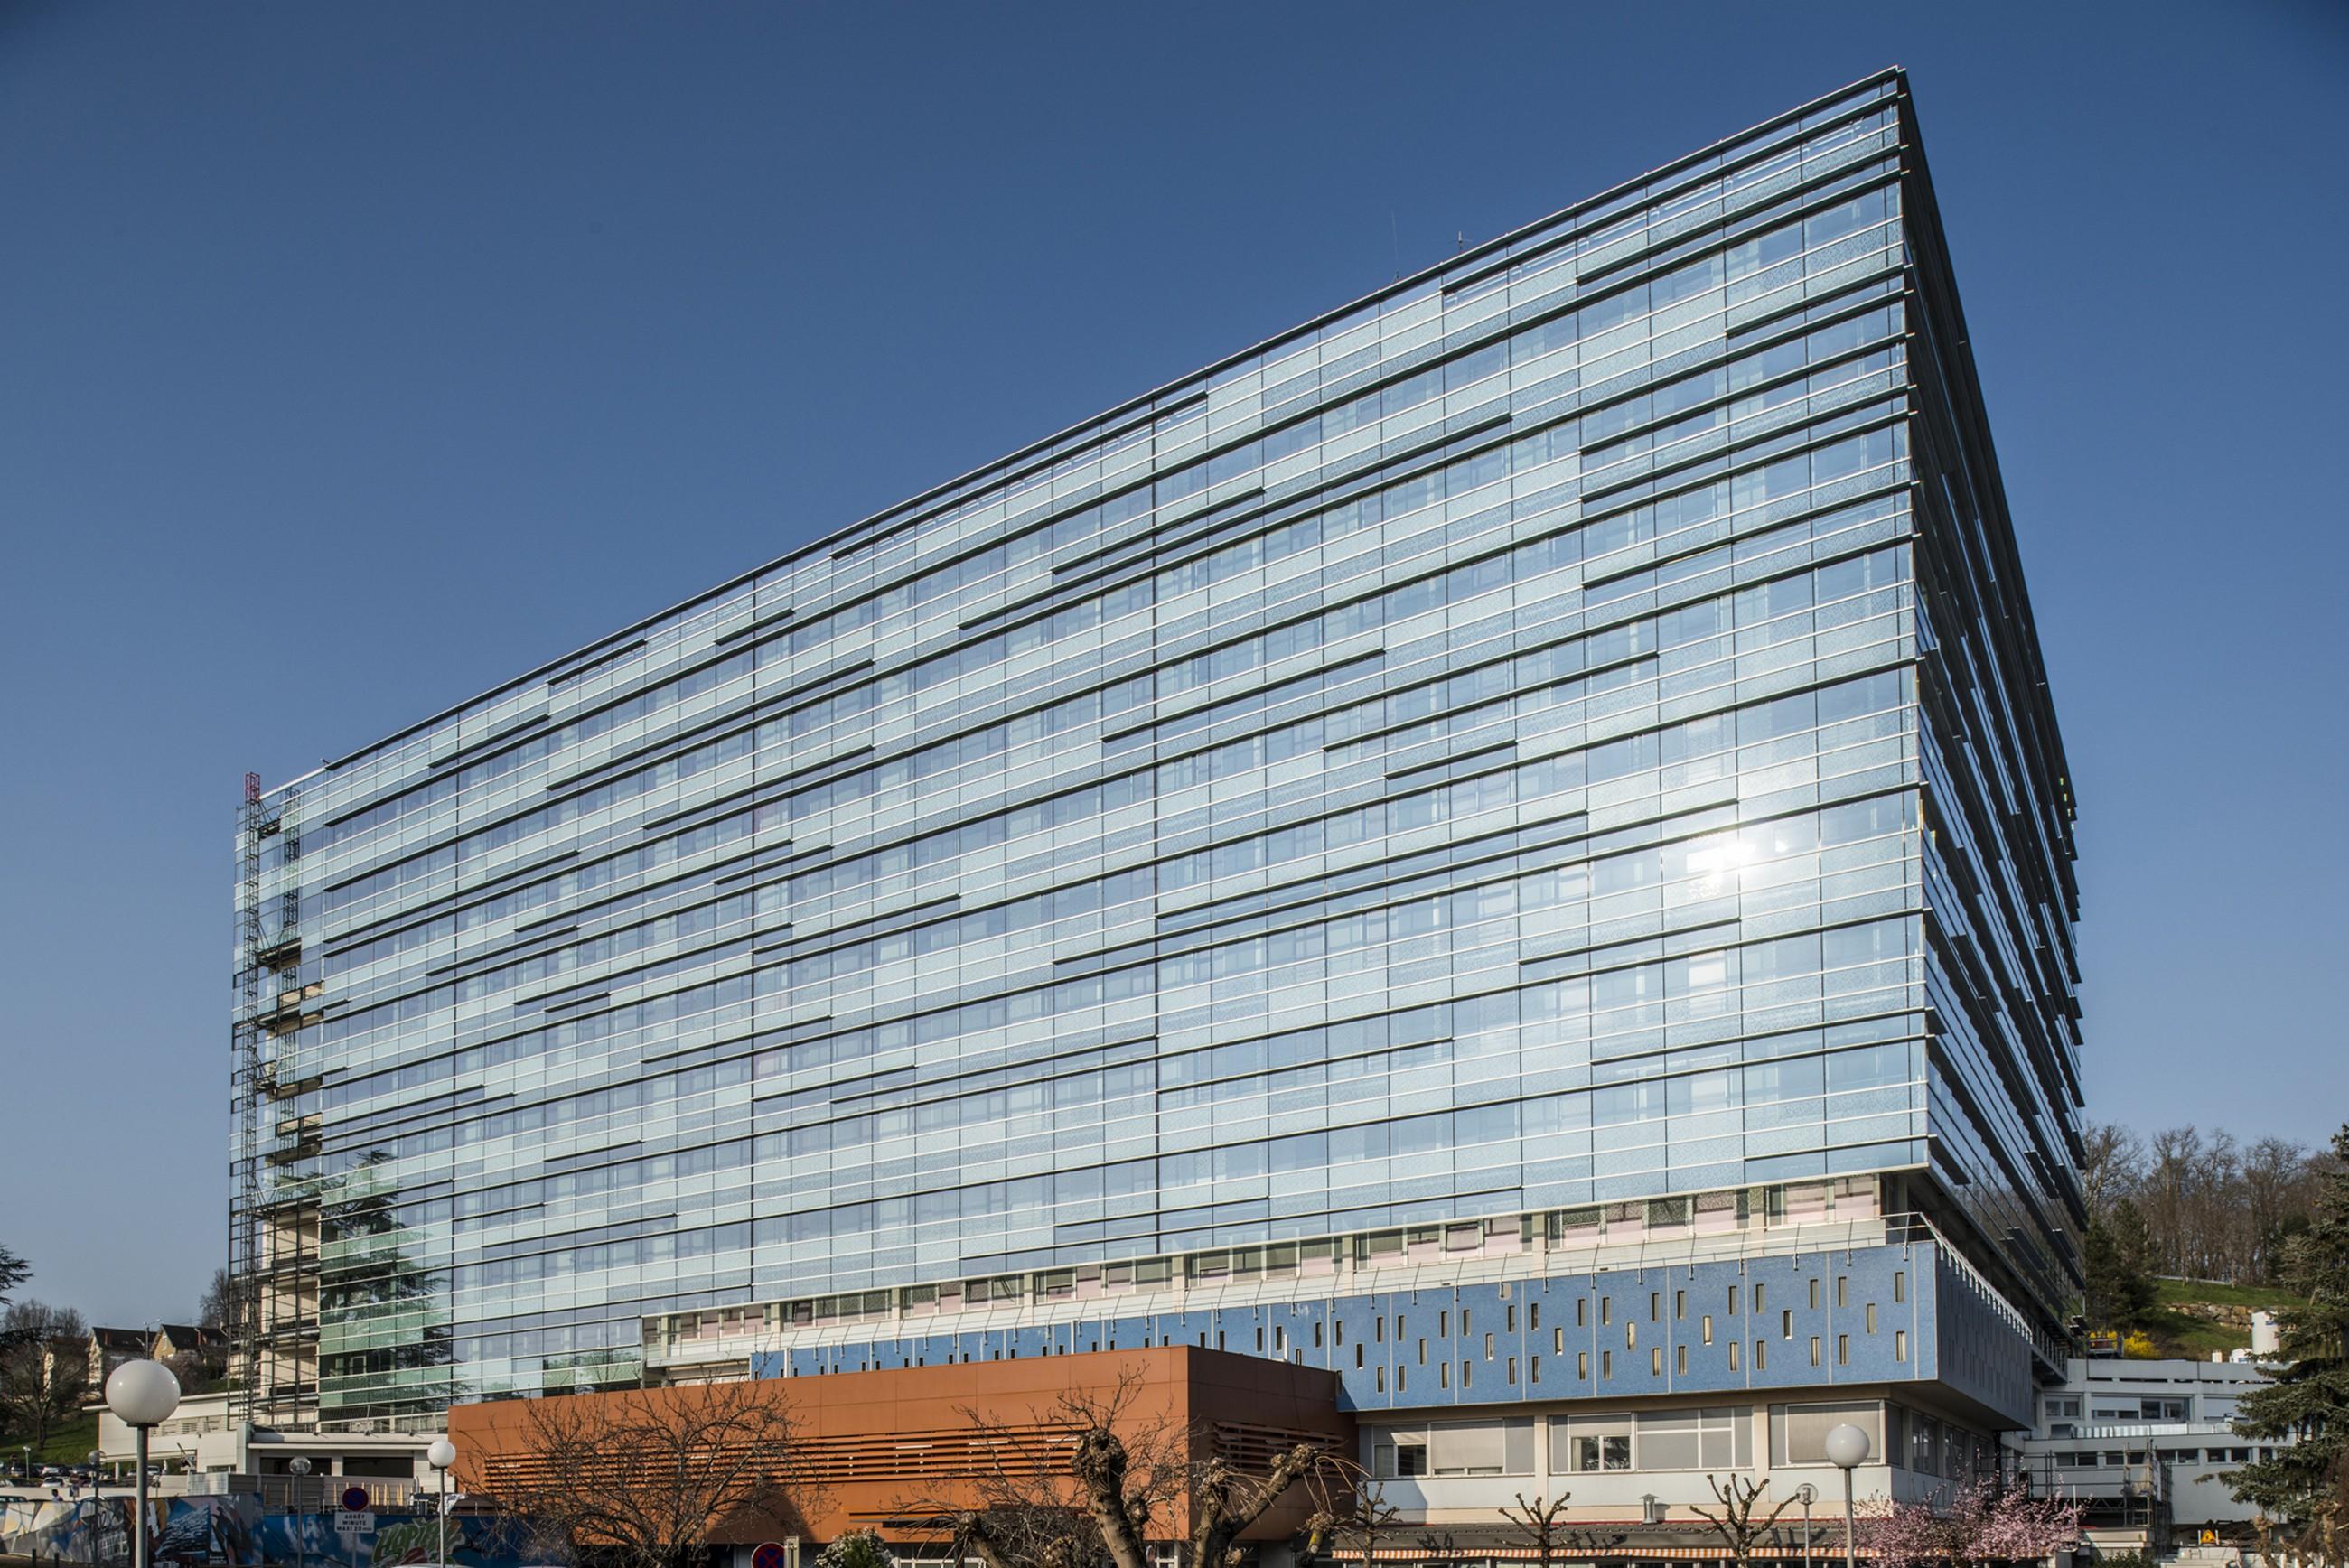 double skin facade renovation at brive la gaillarde 39 s hospital espagno milani architectes. Black Bedroom Furniture Sets. Home Design Ideas